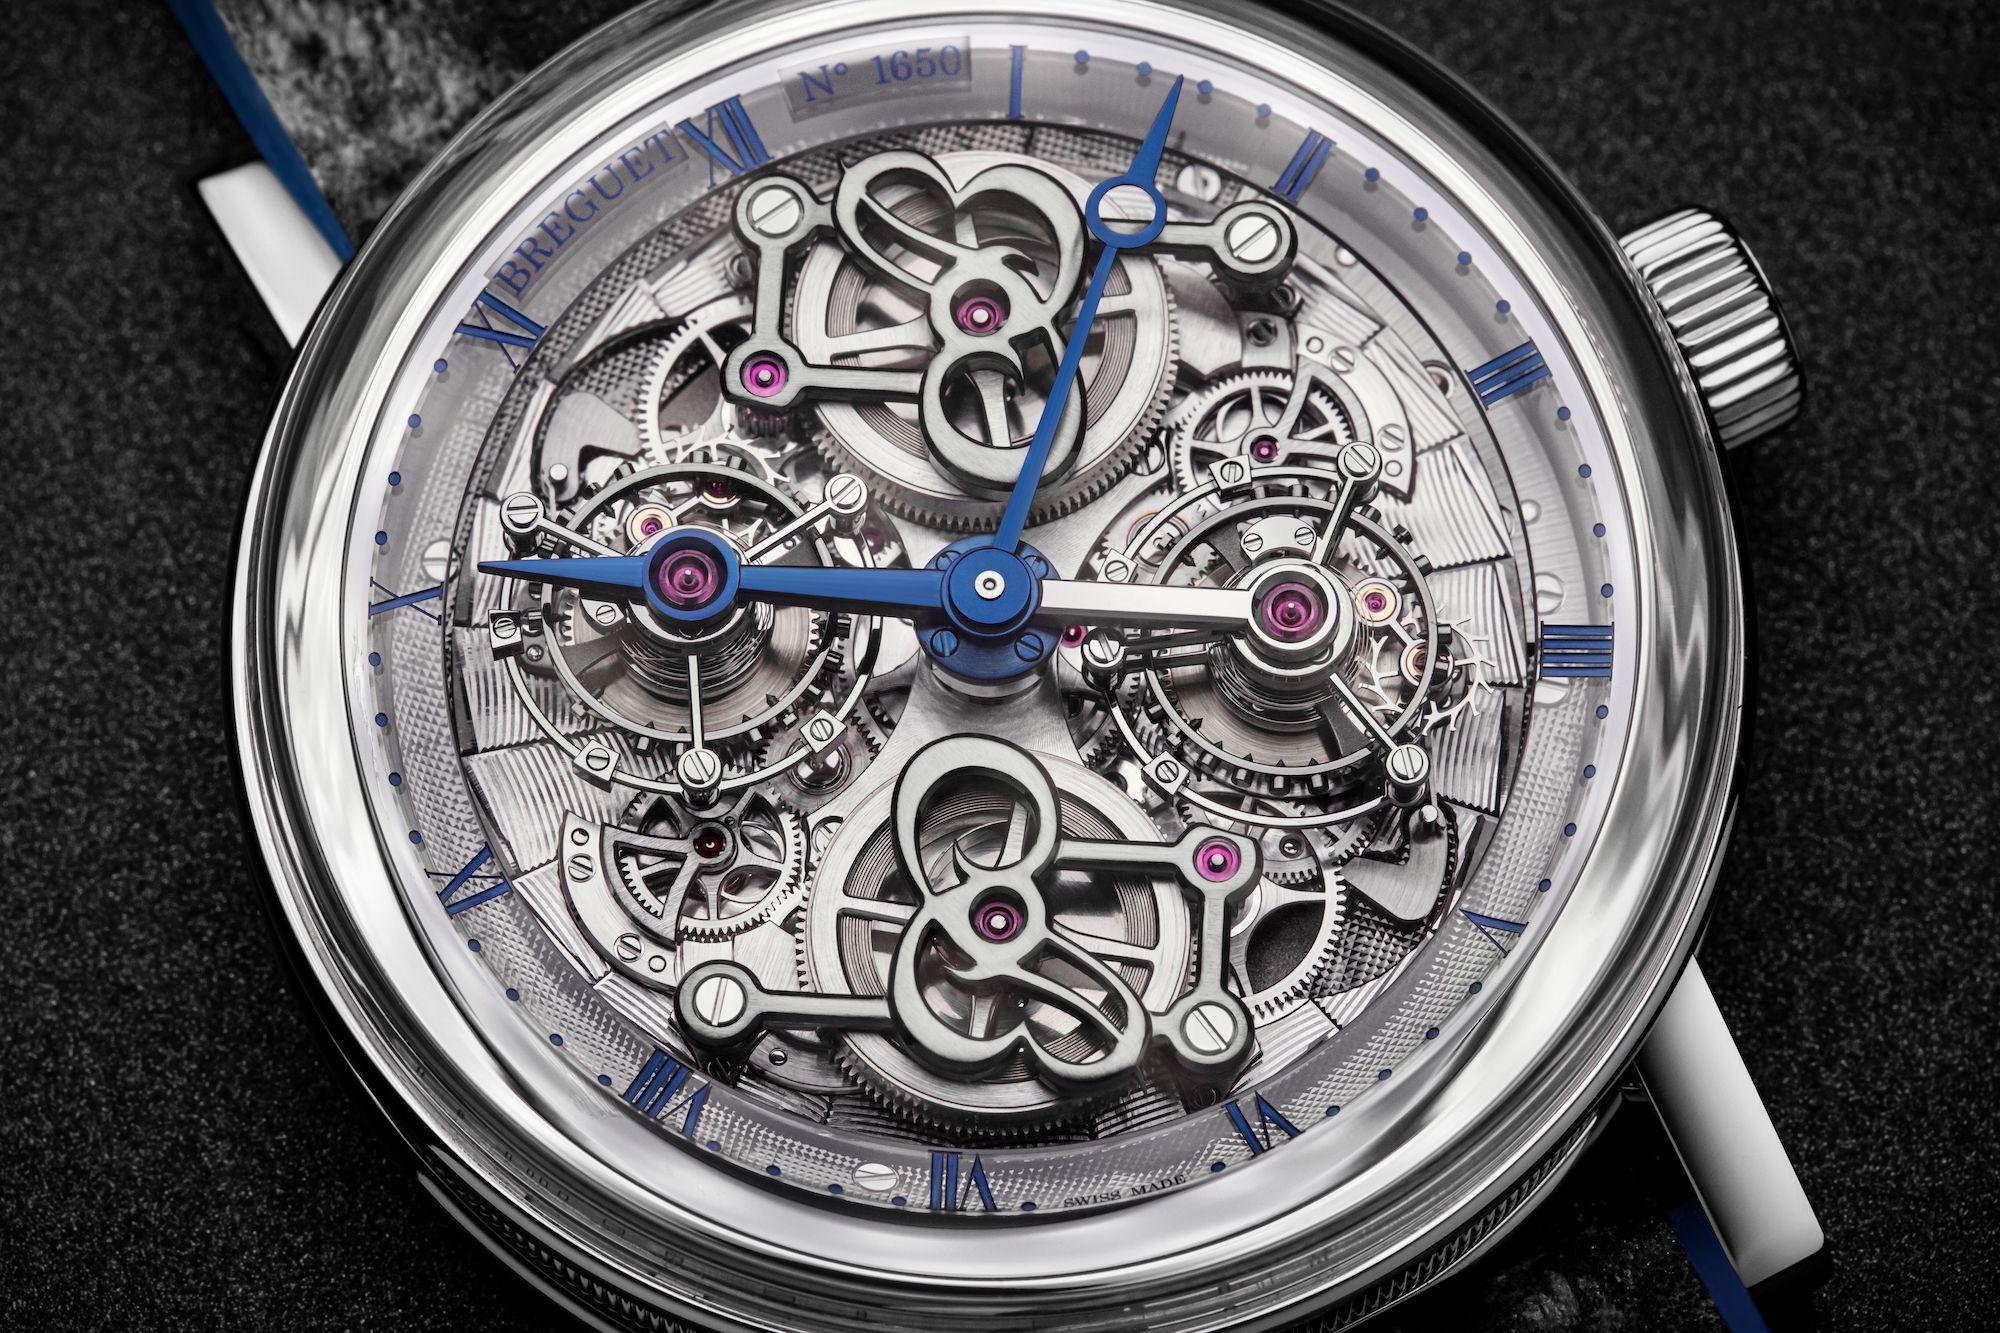 Breguet Classique Double Tourbillon Quai de l'Horloge 5345 detalle